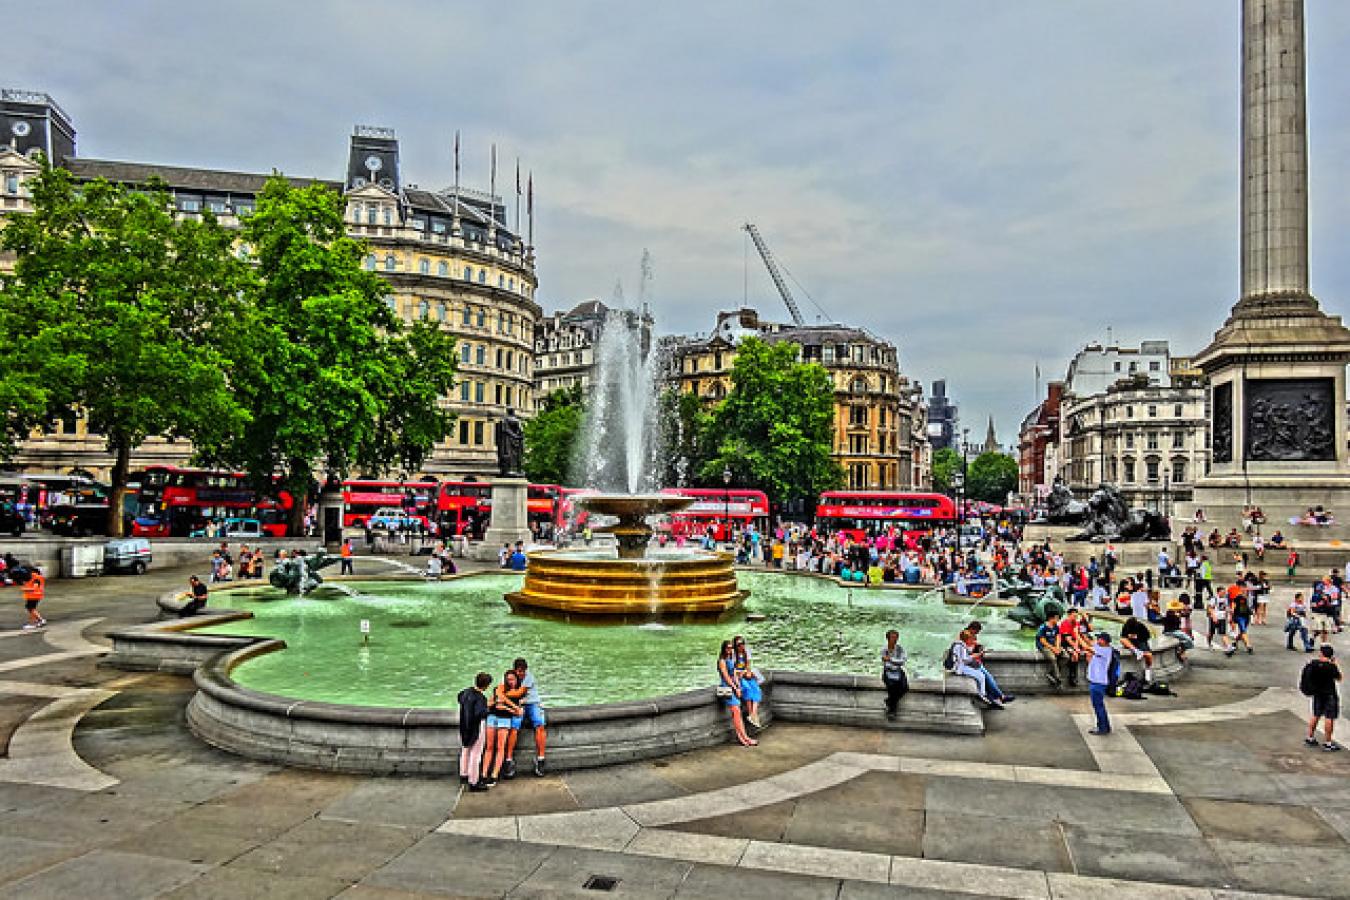 London July 20 2018 (124) Super Fountain Trafalgar Square, UK